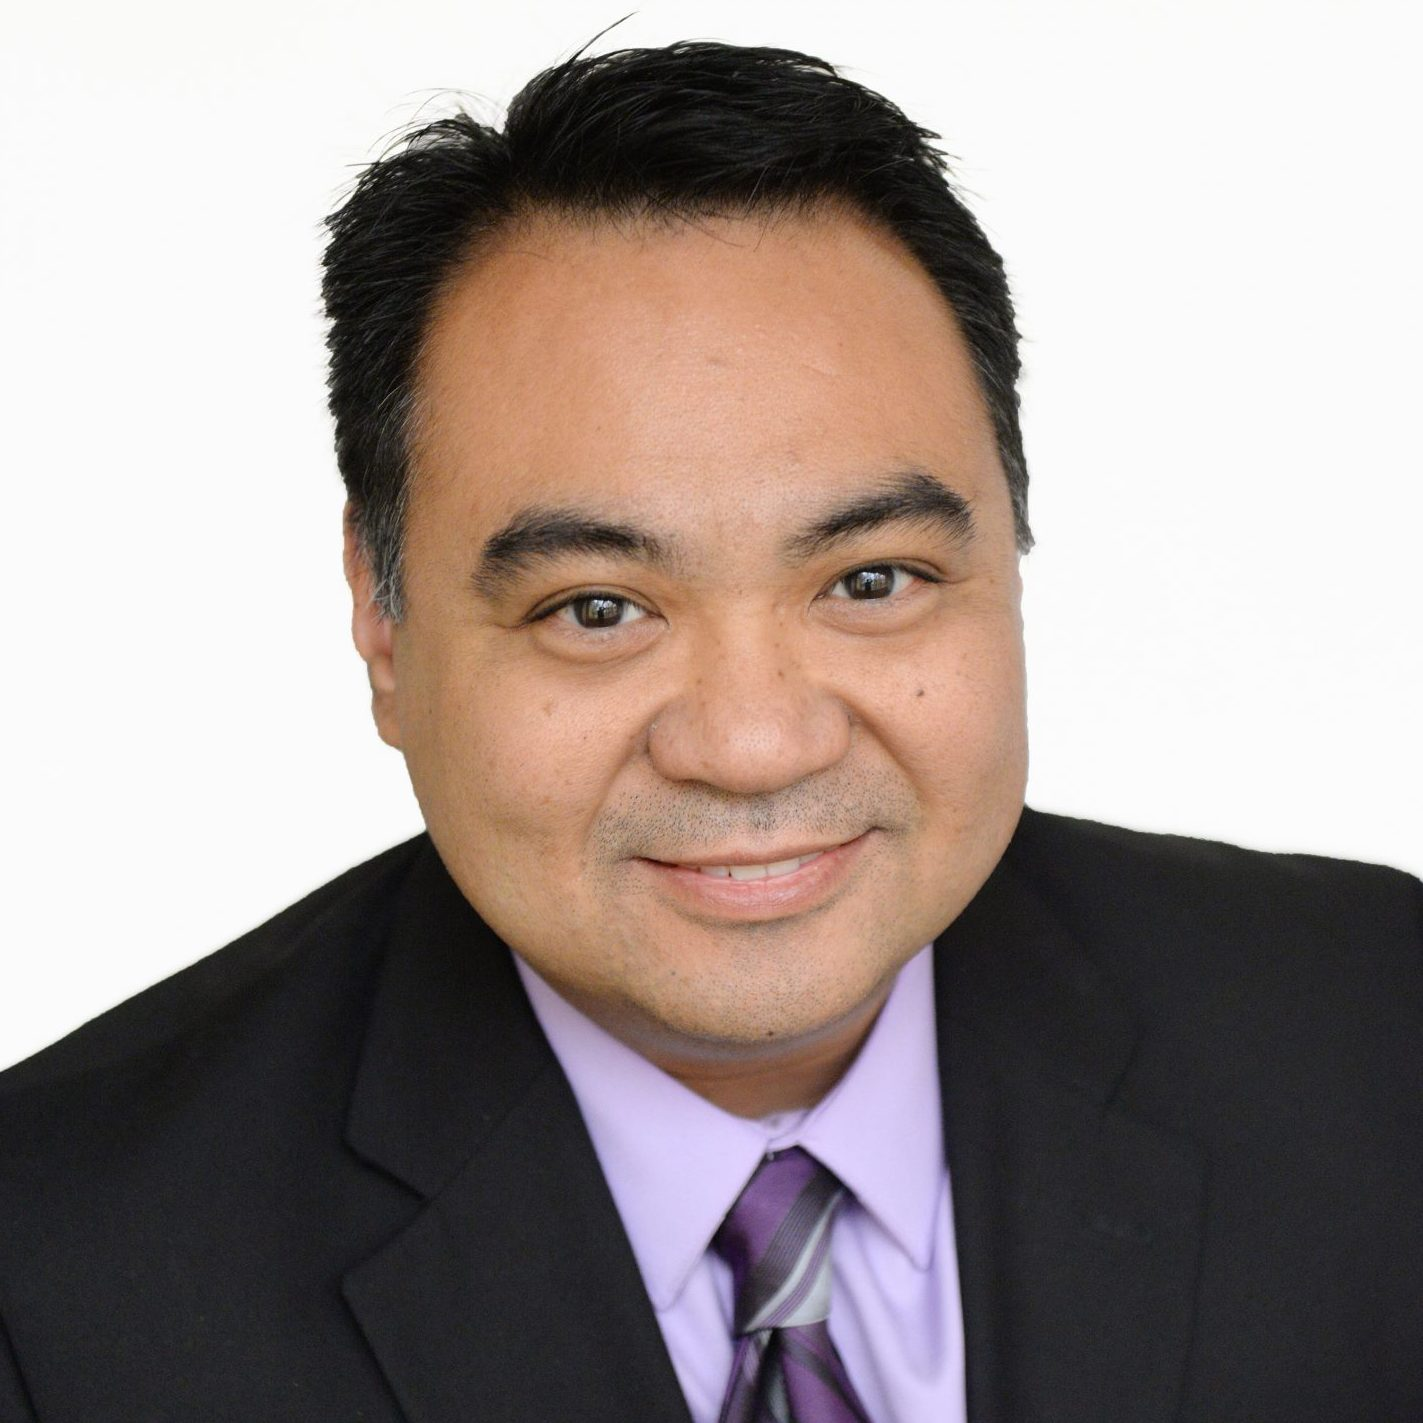 Dr. Marvin Campos - Headshot